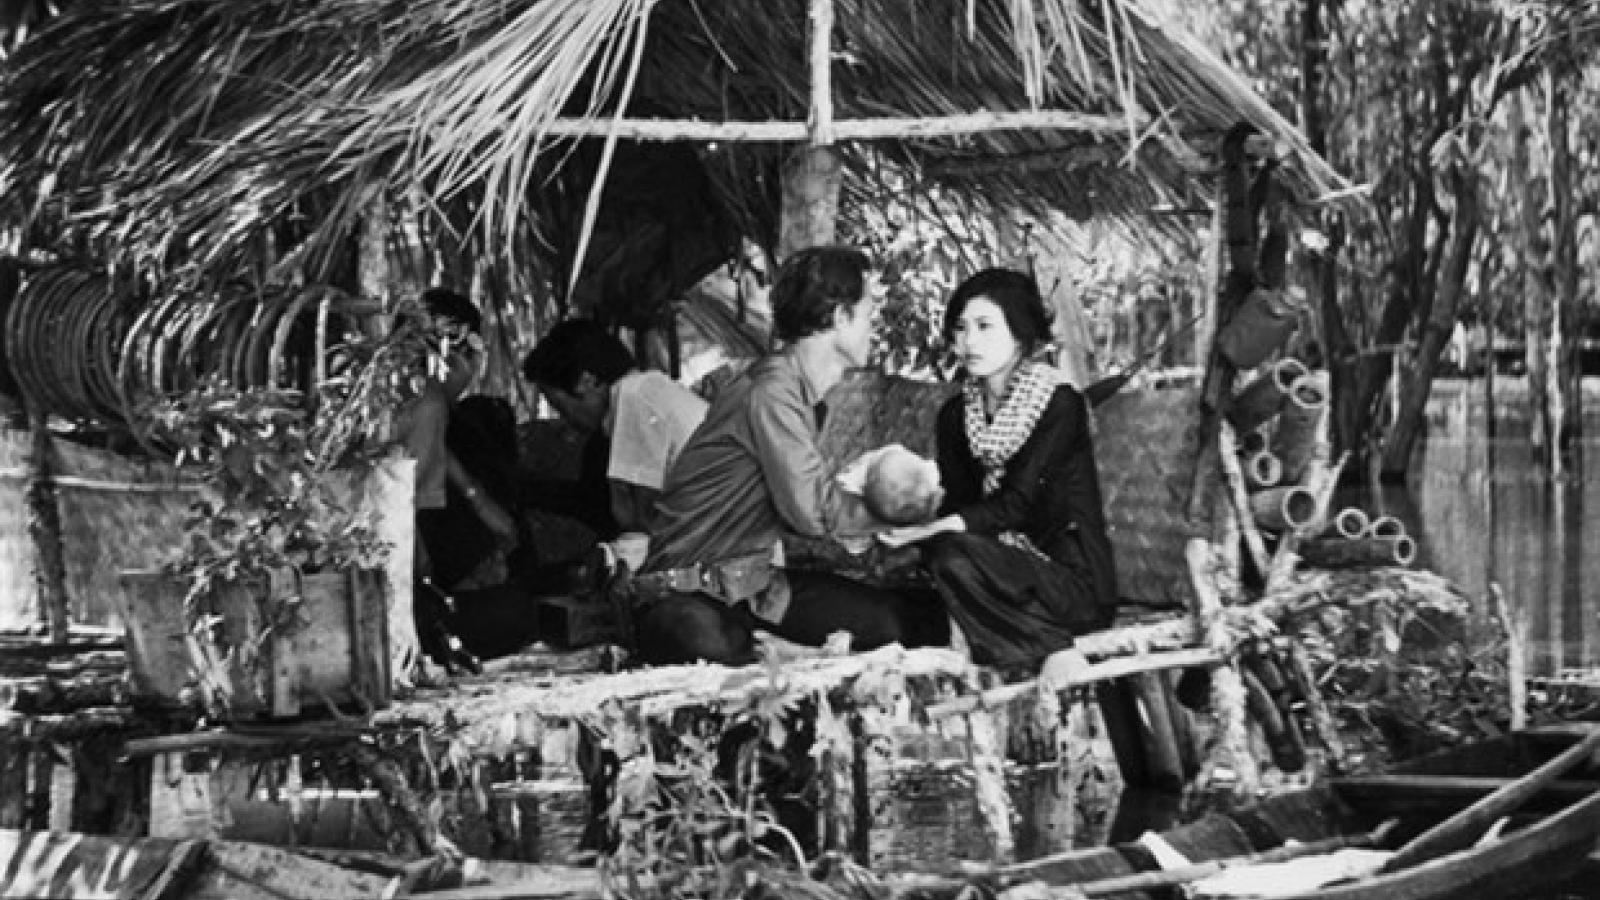 Film digitalisation helps to conserve national cinema heritage